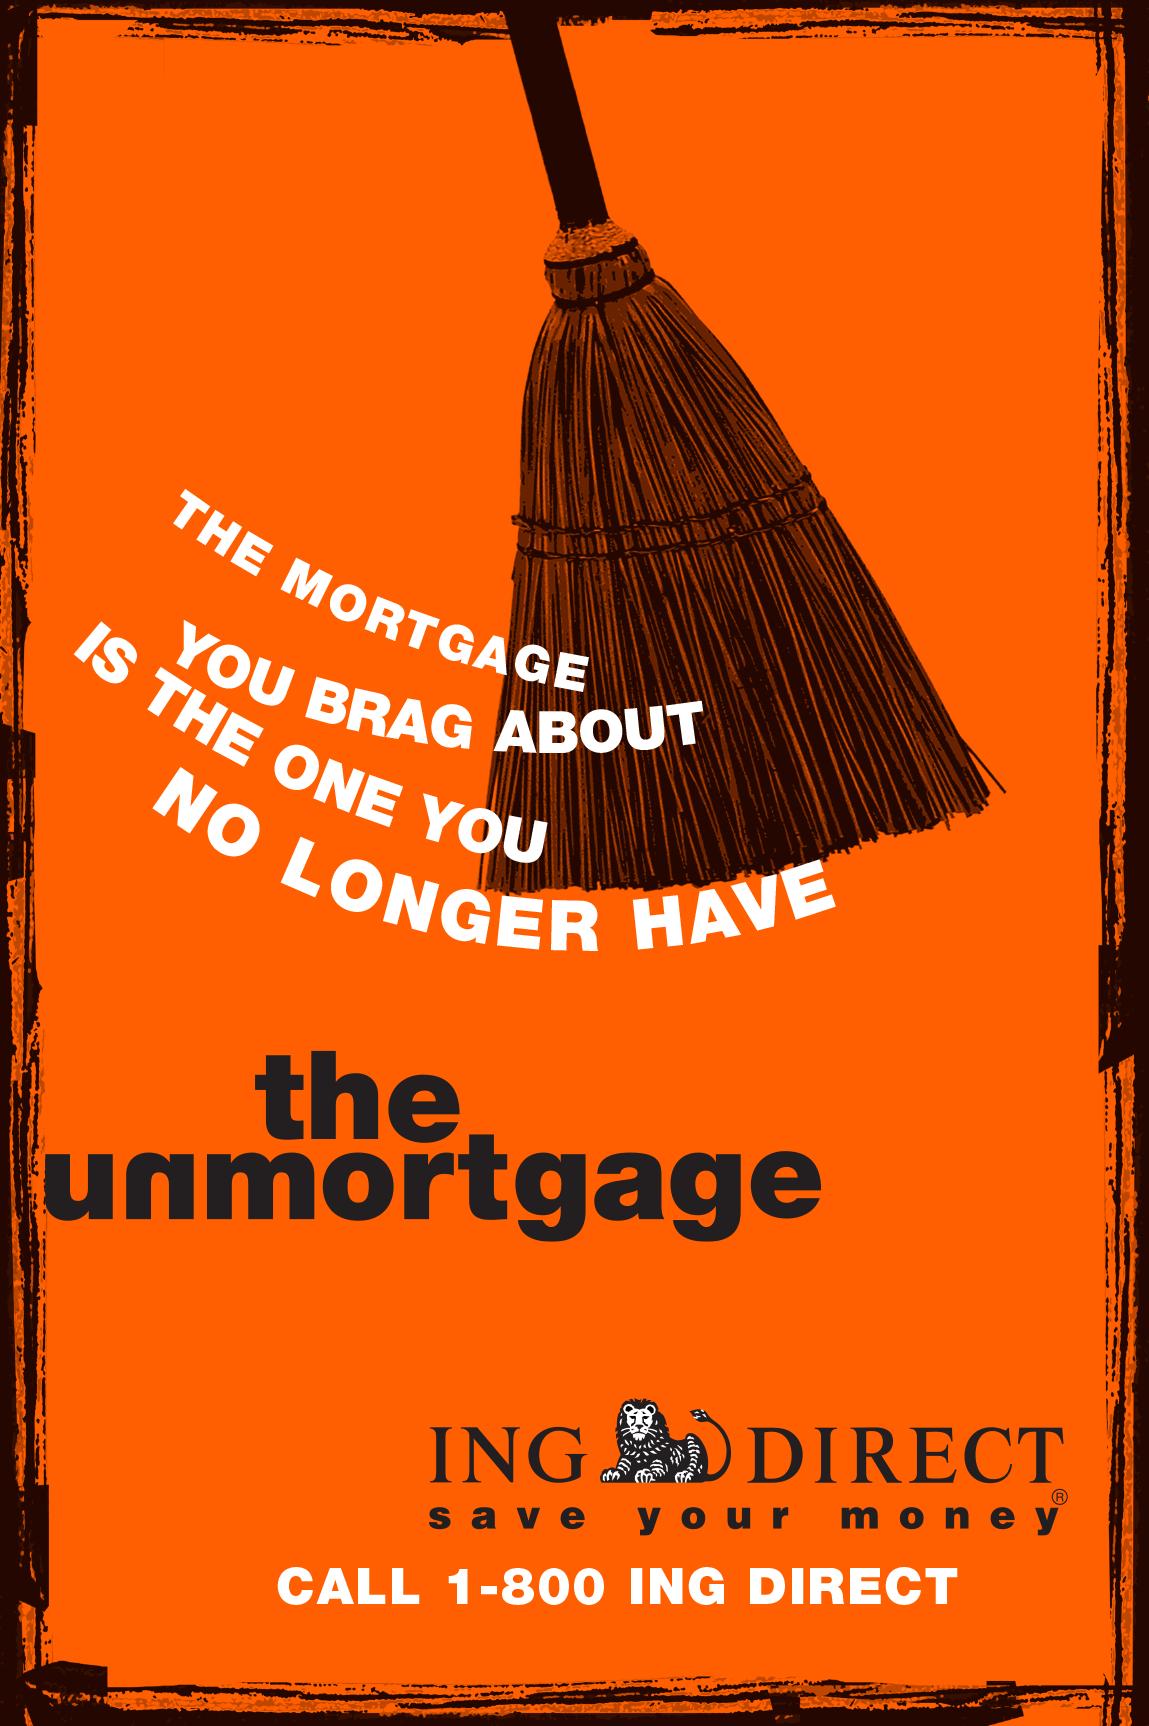 C51922_Reprint_OOH_unmortgage